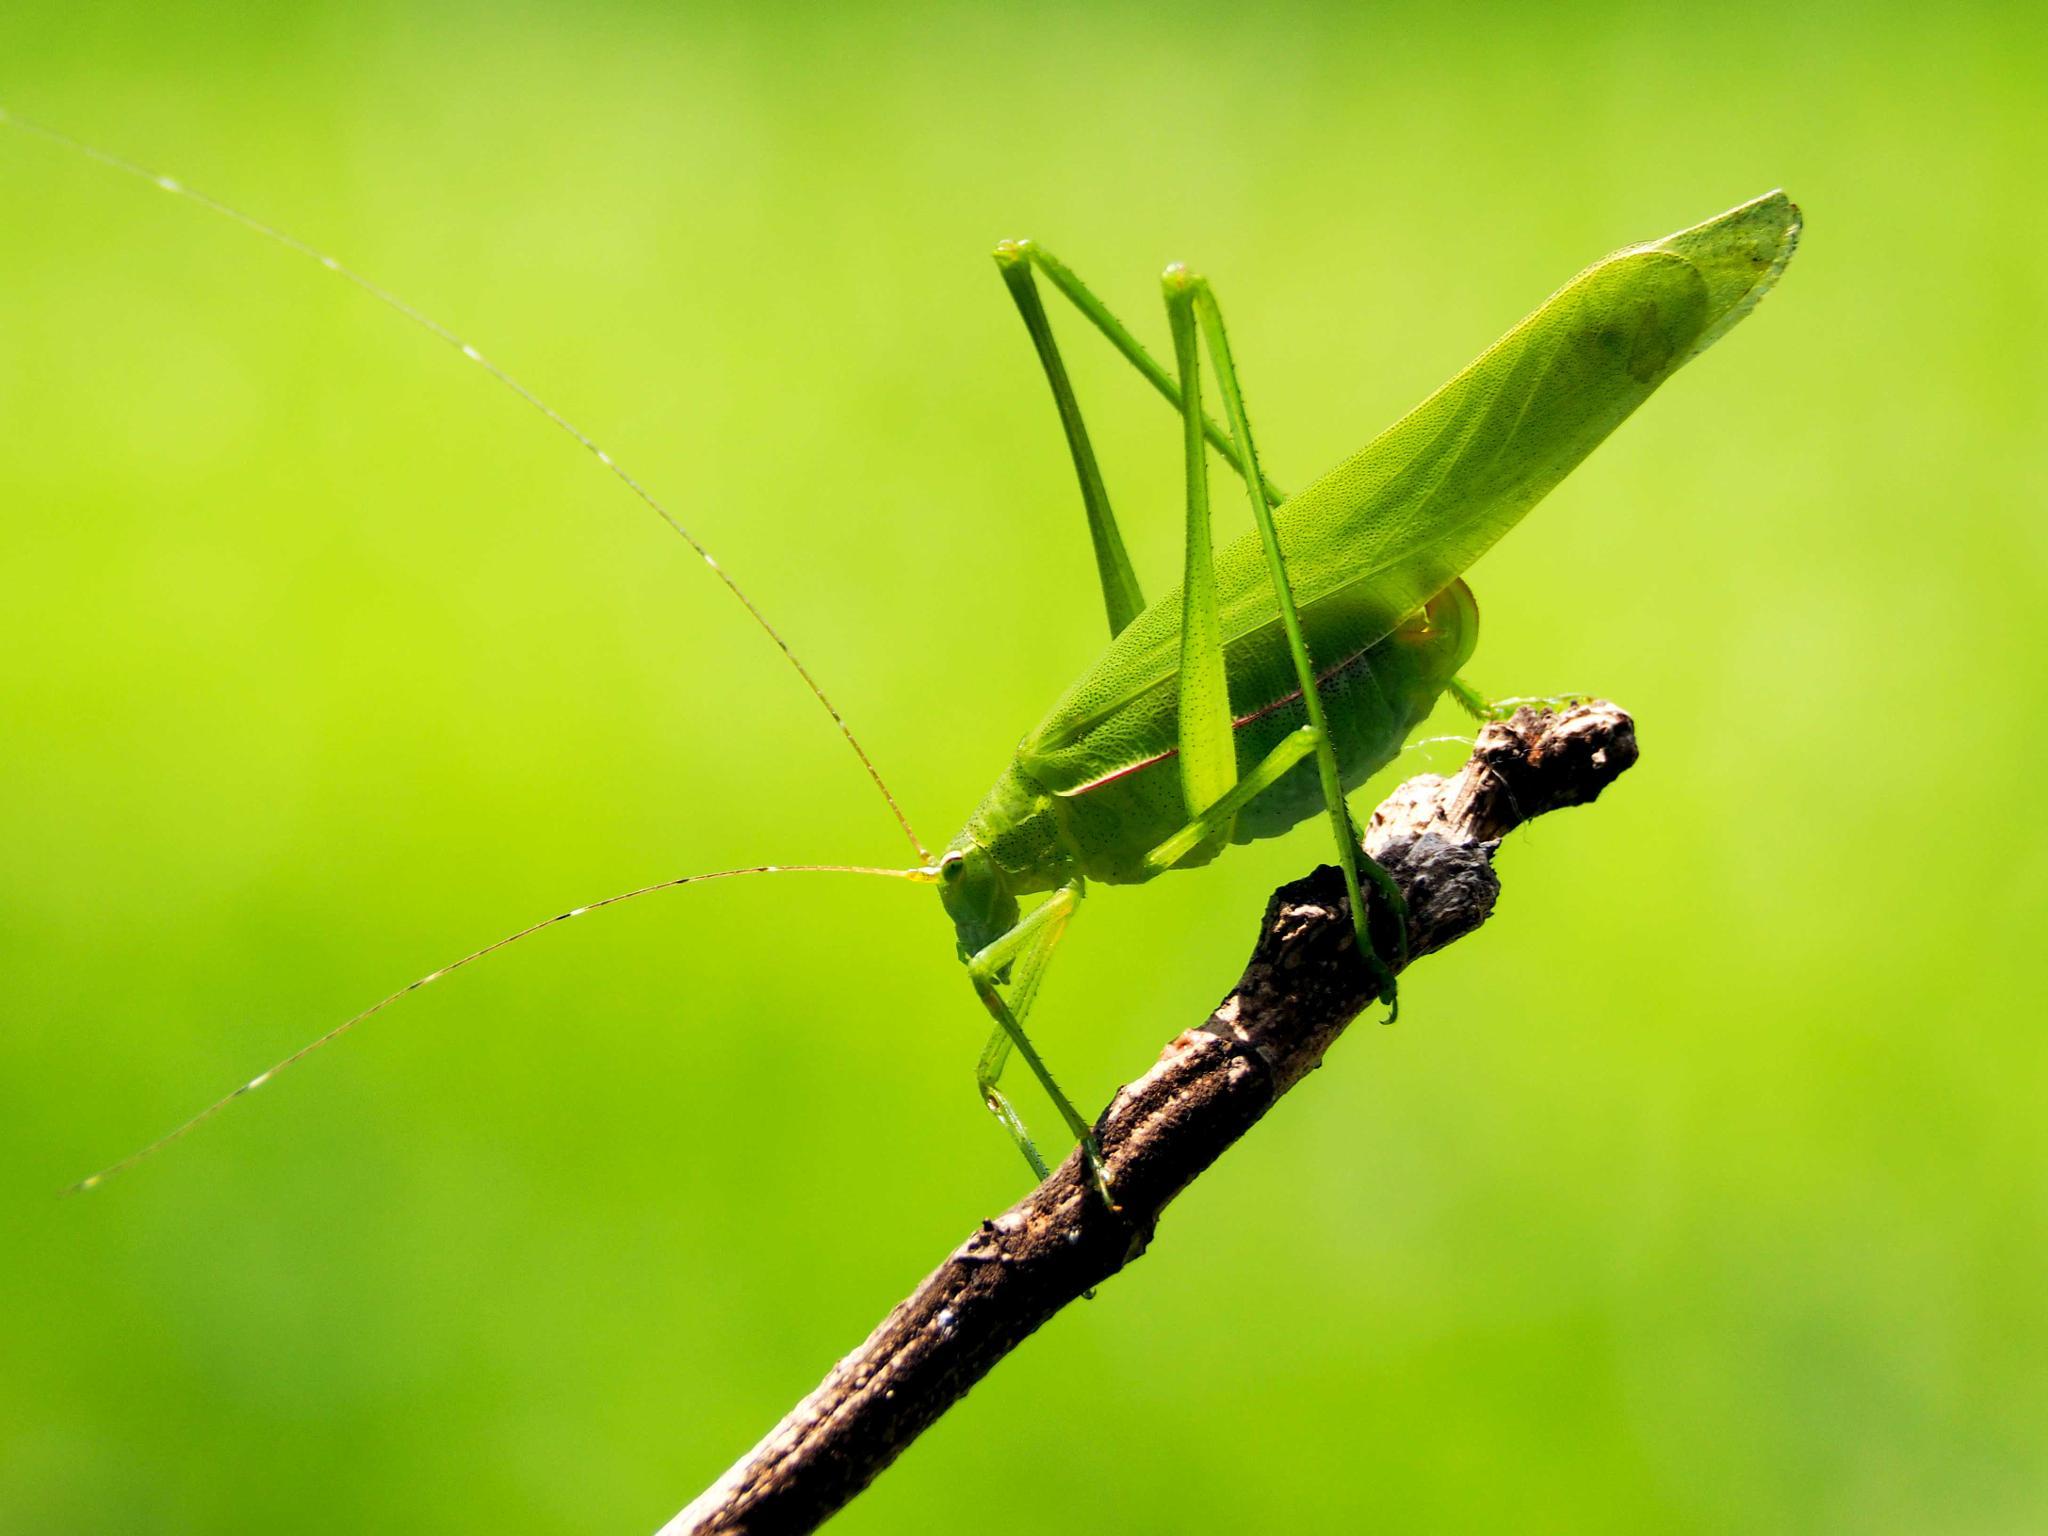 Long-horned grasshopper by Tran Ngoc Nghi